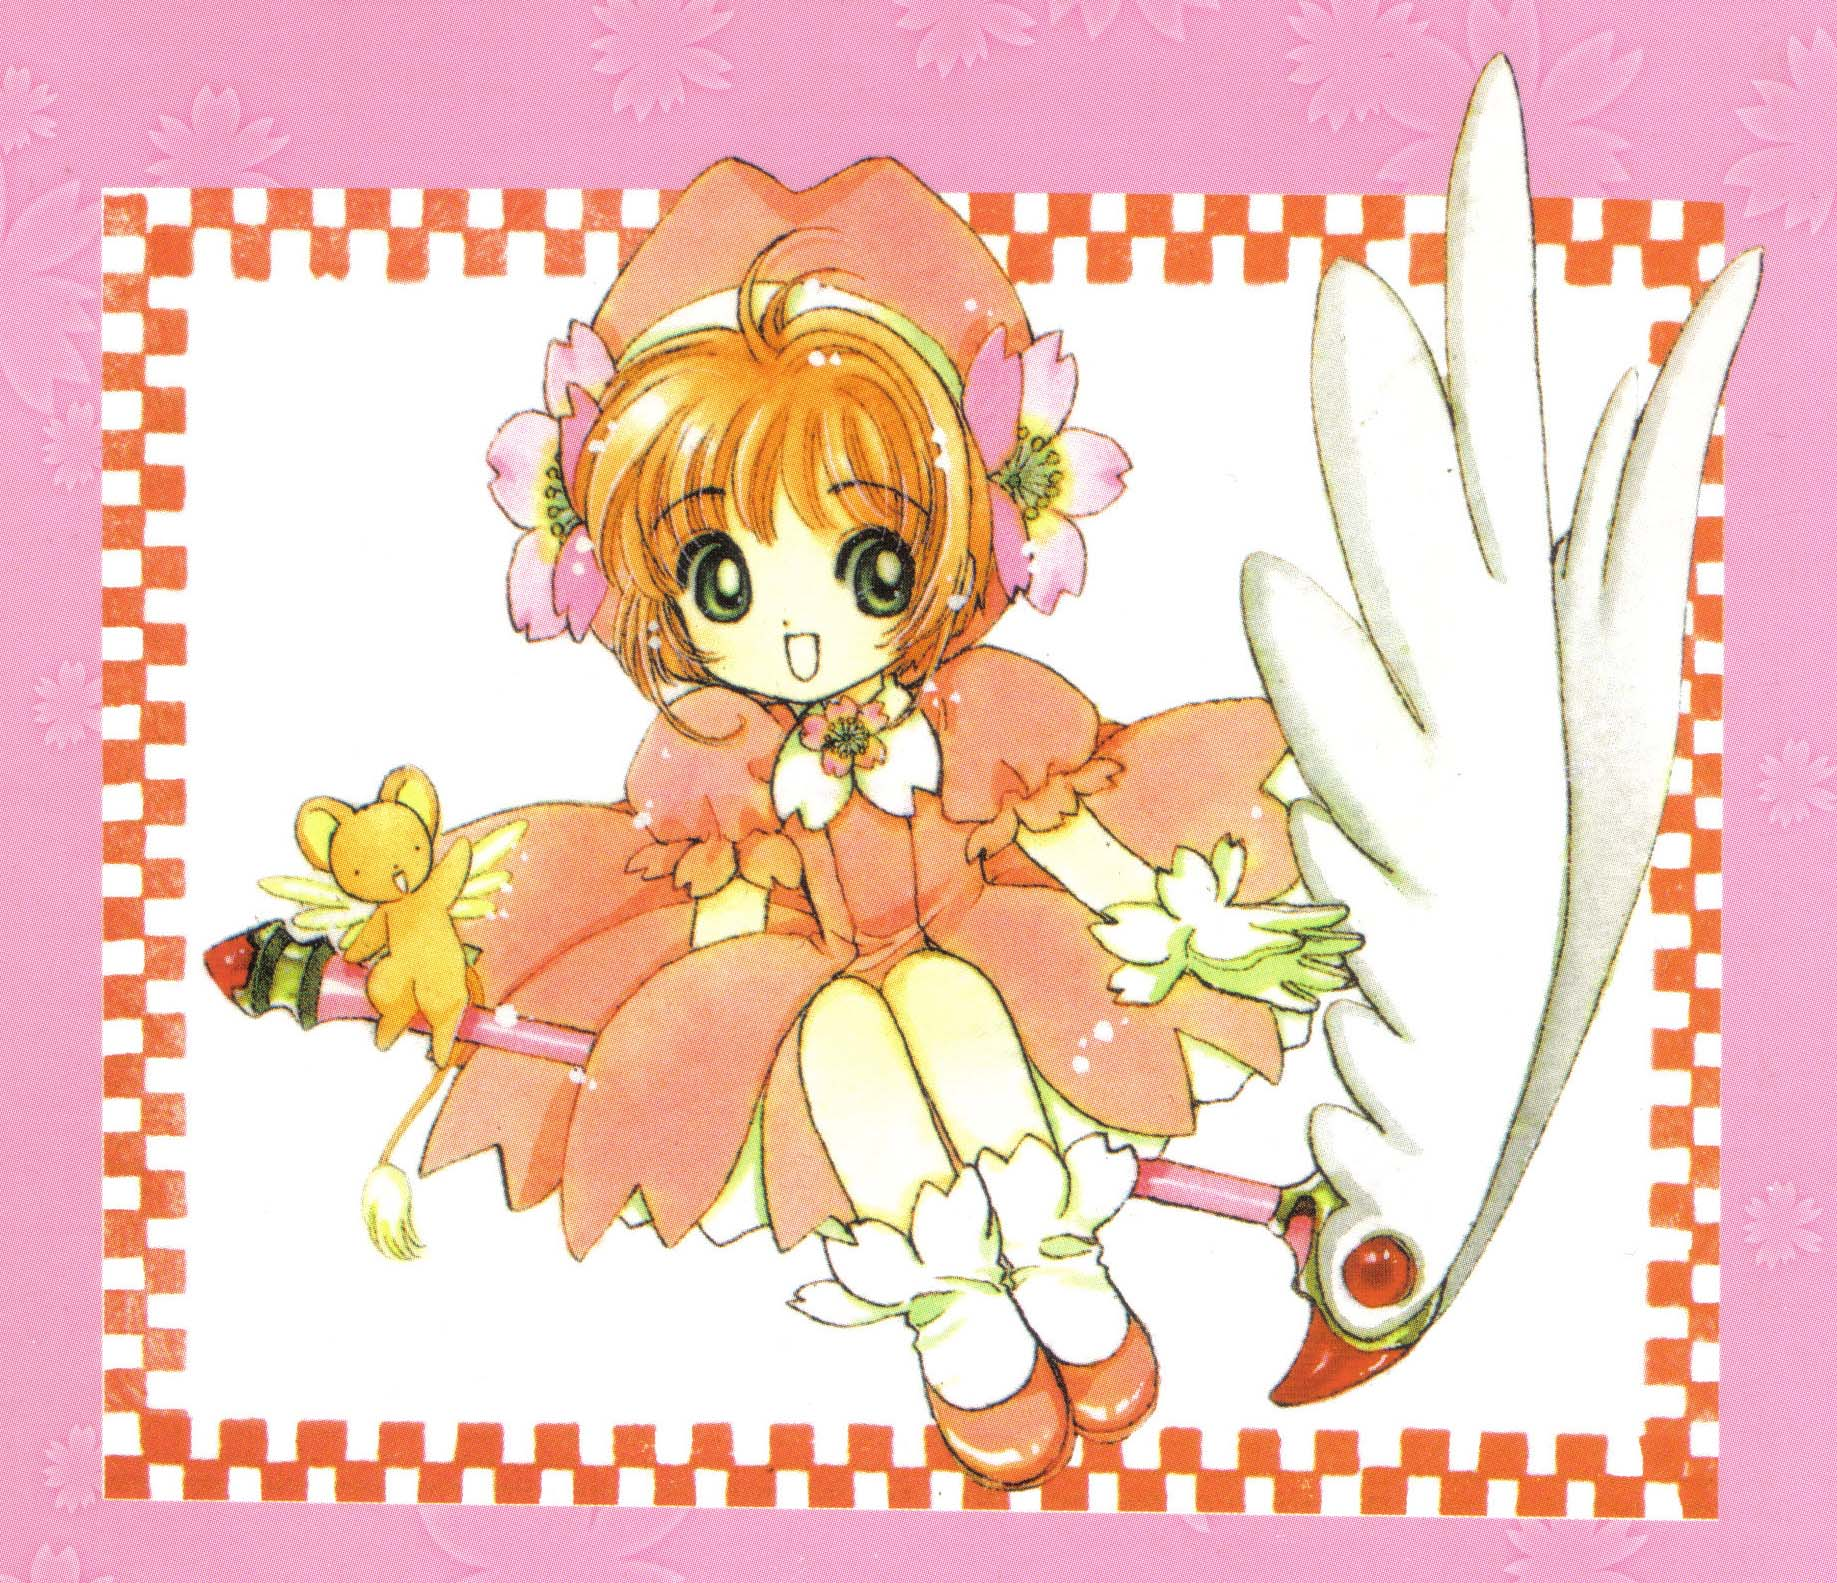 Cardcaptor Sakura Sakura Kinomoto Chibi